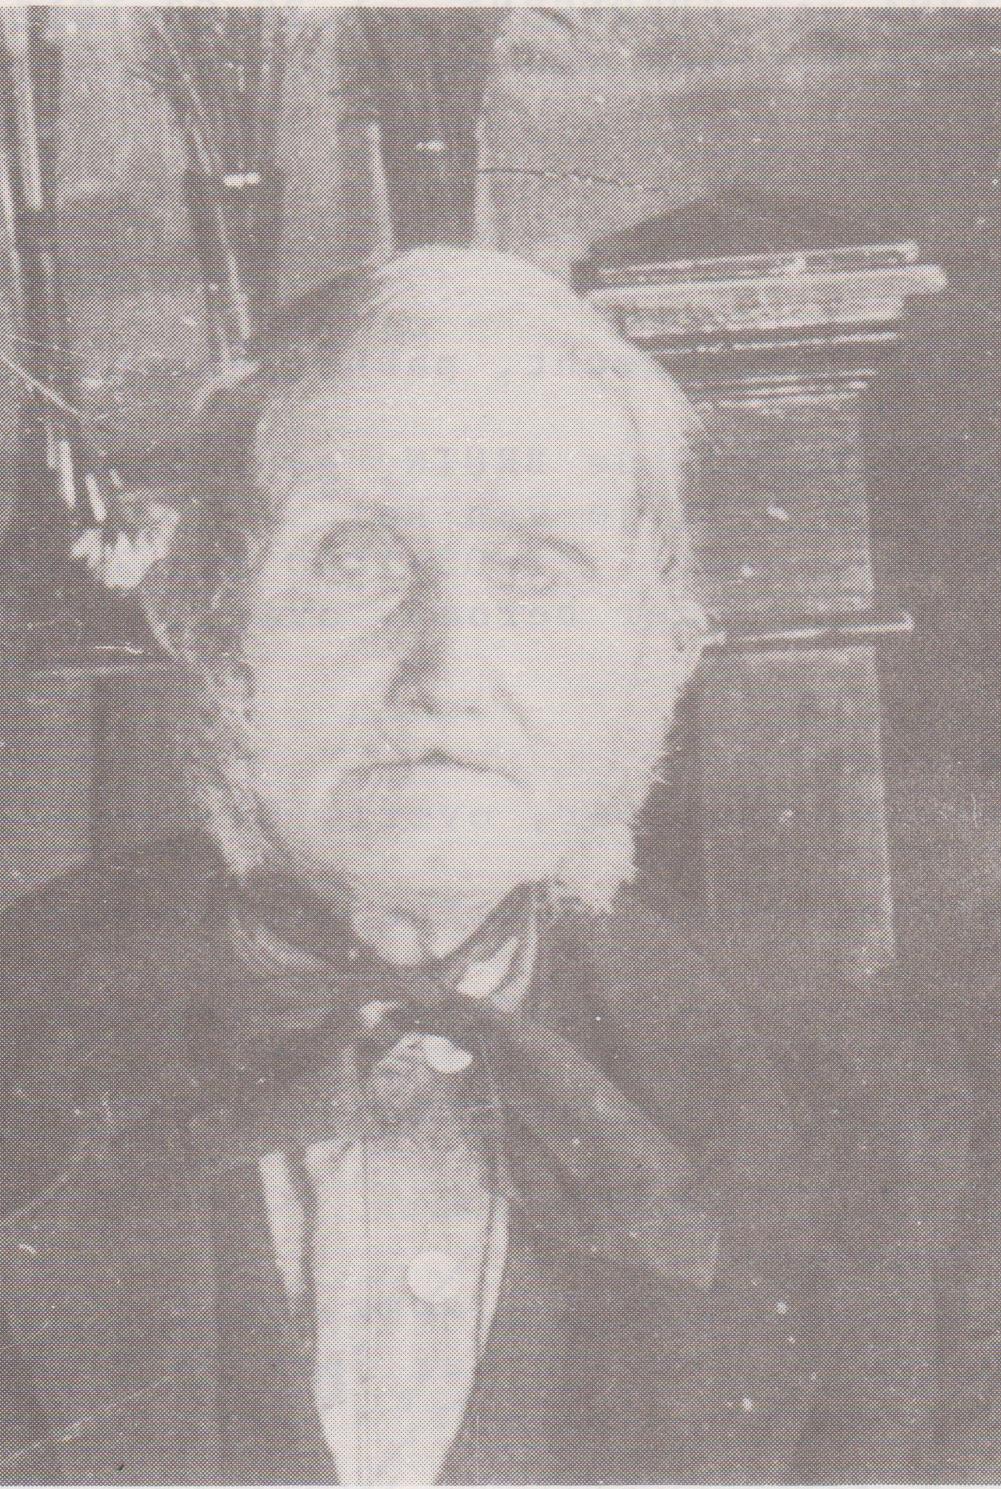 Pieter Buitelaar 16-03-1837